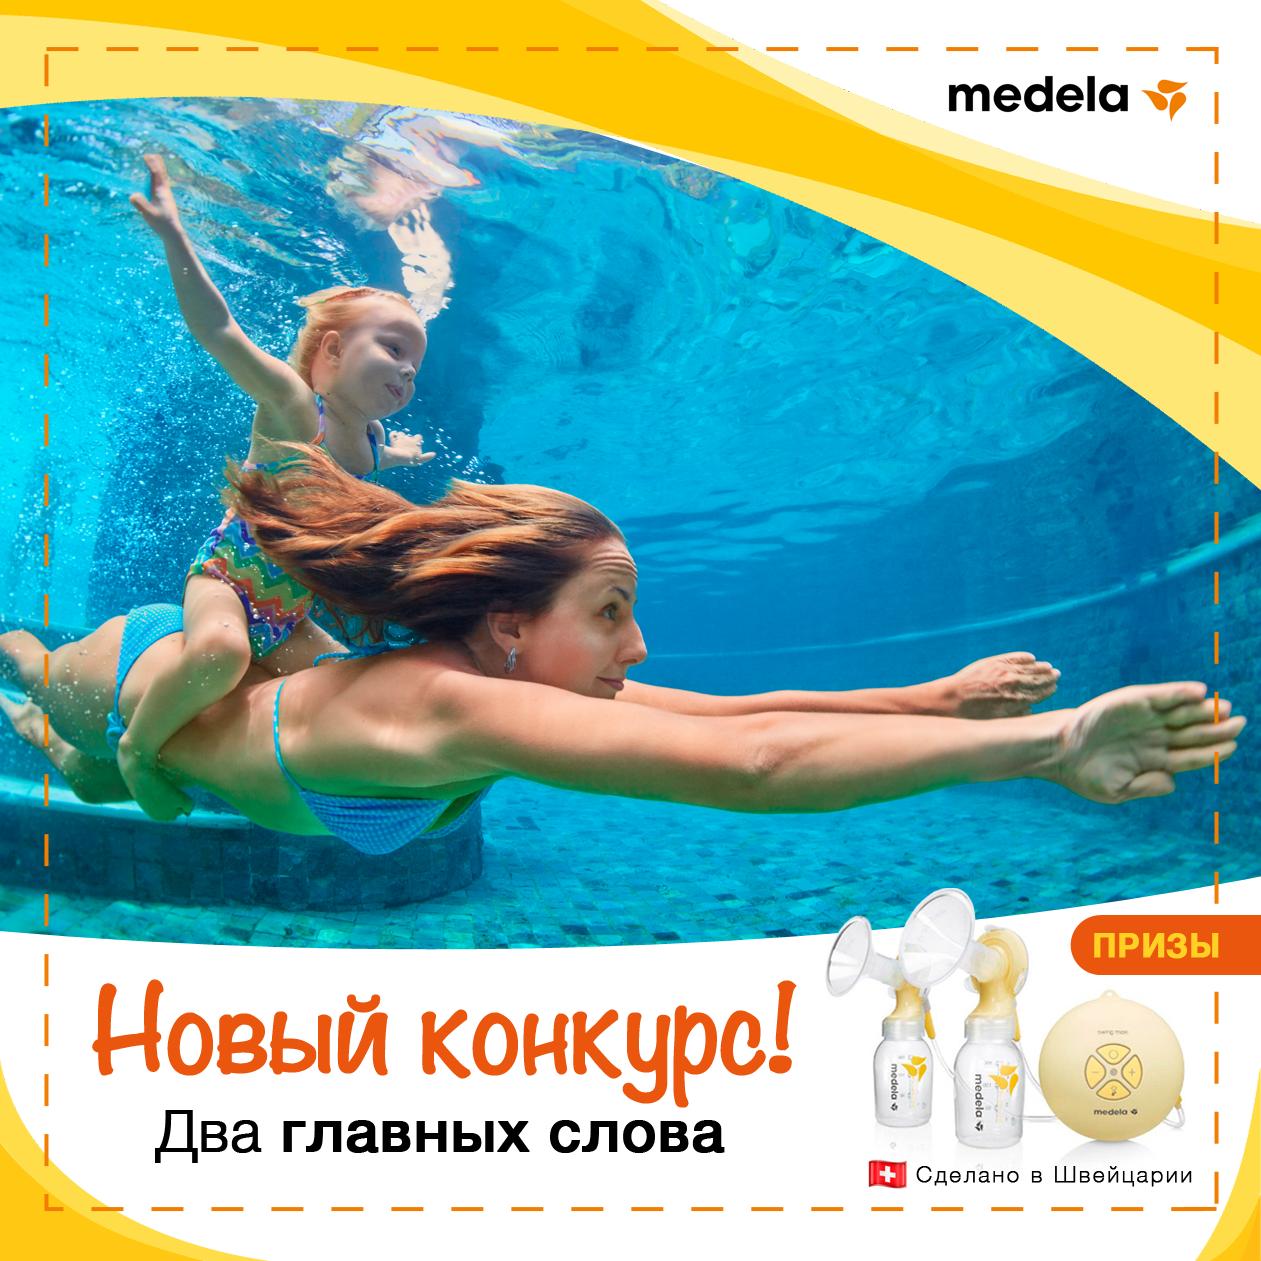 Medela - конкурс instagram